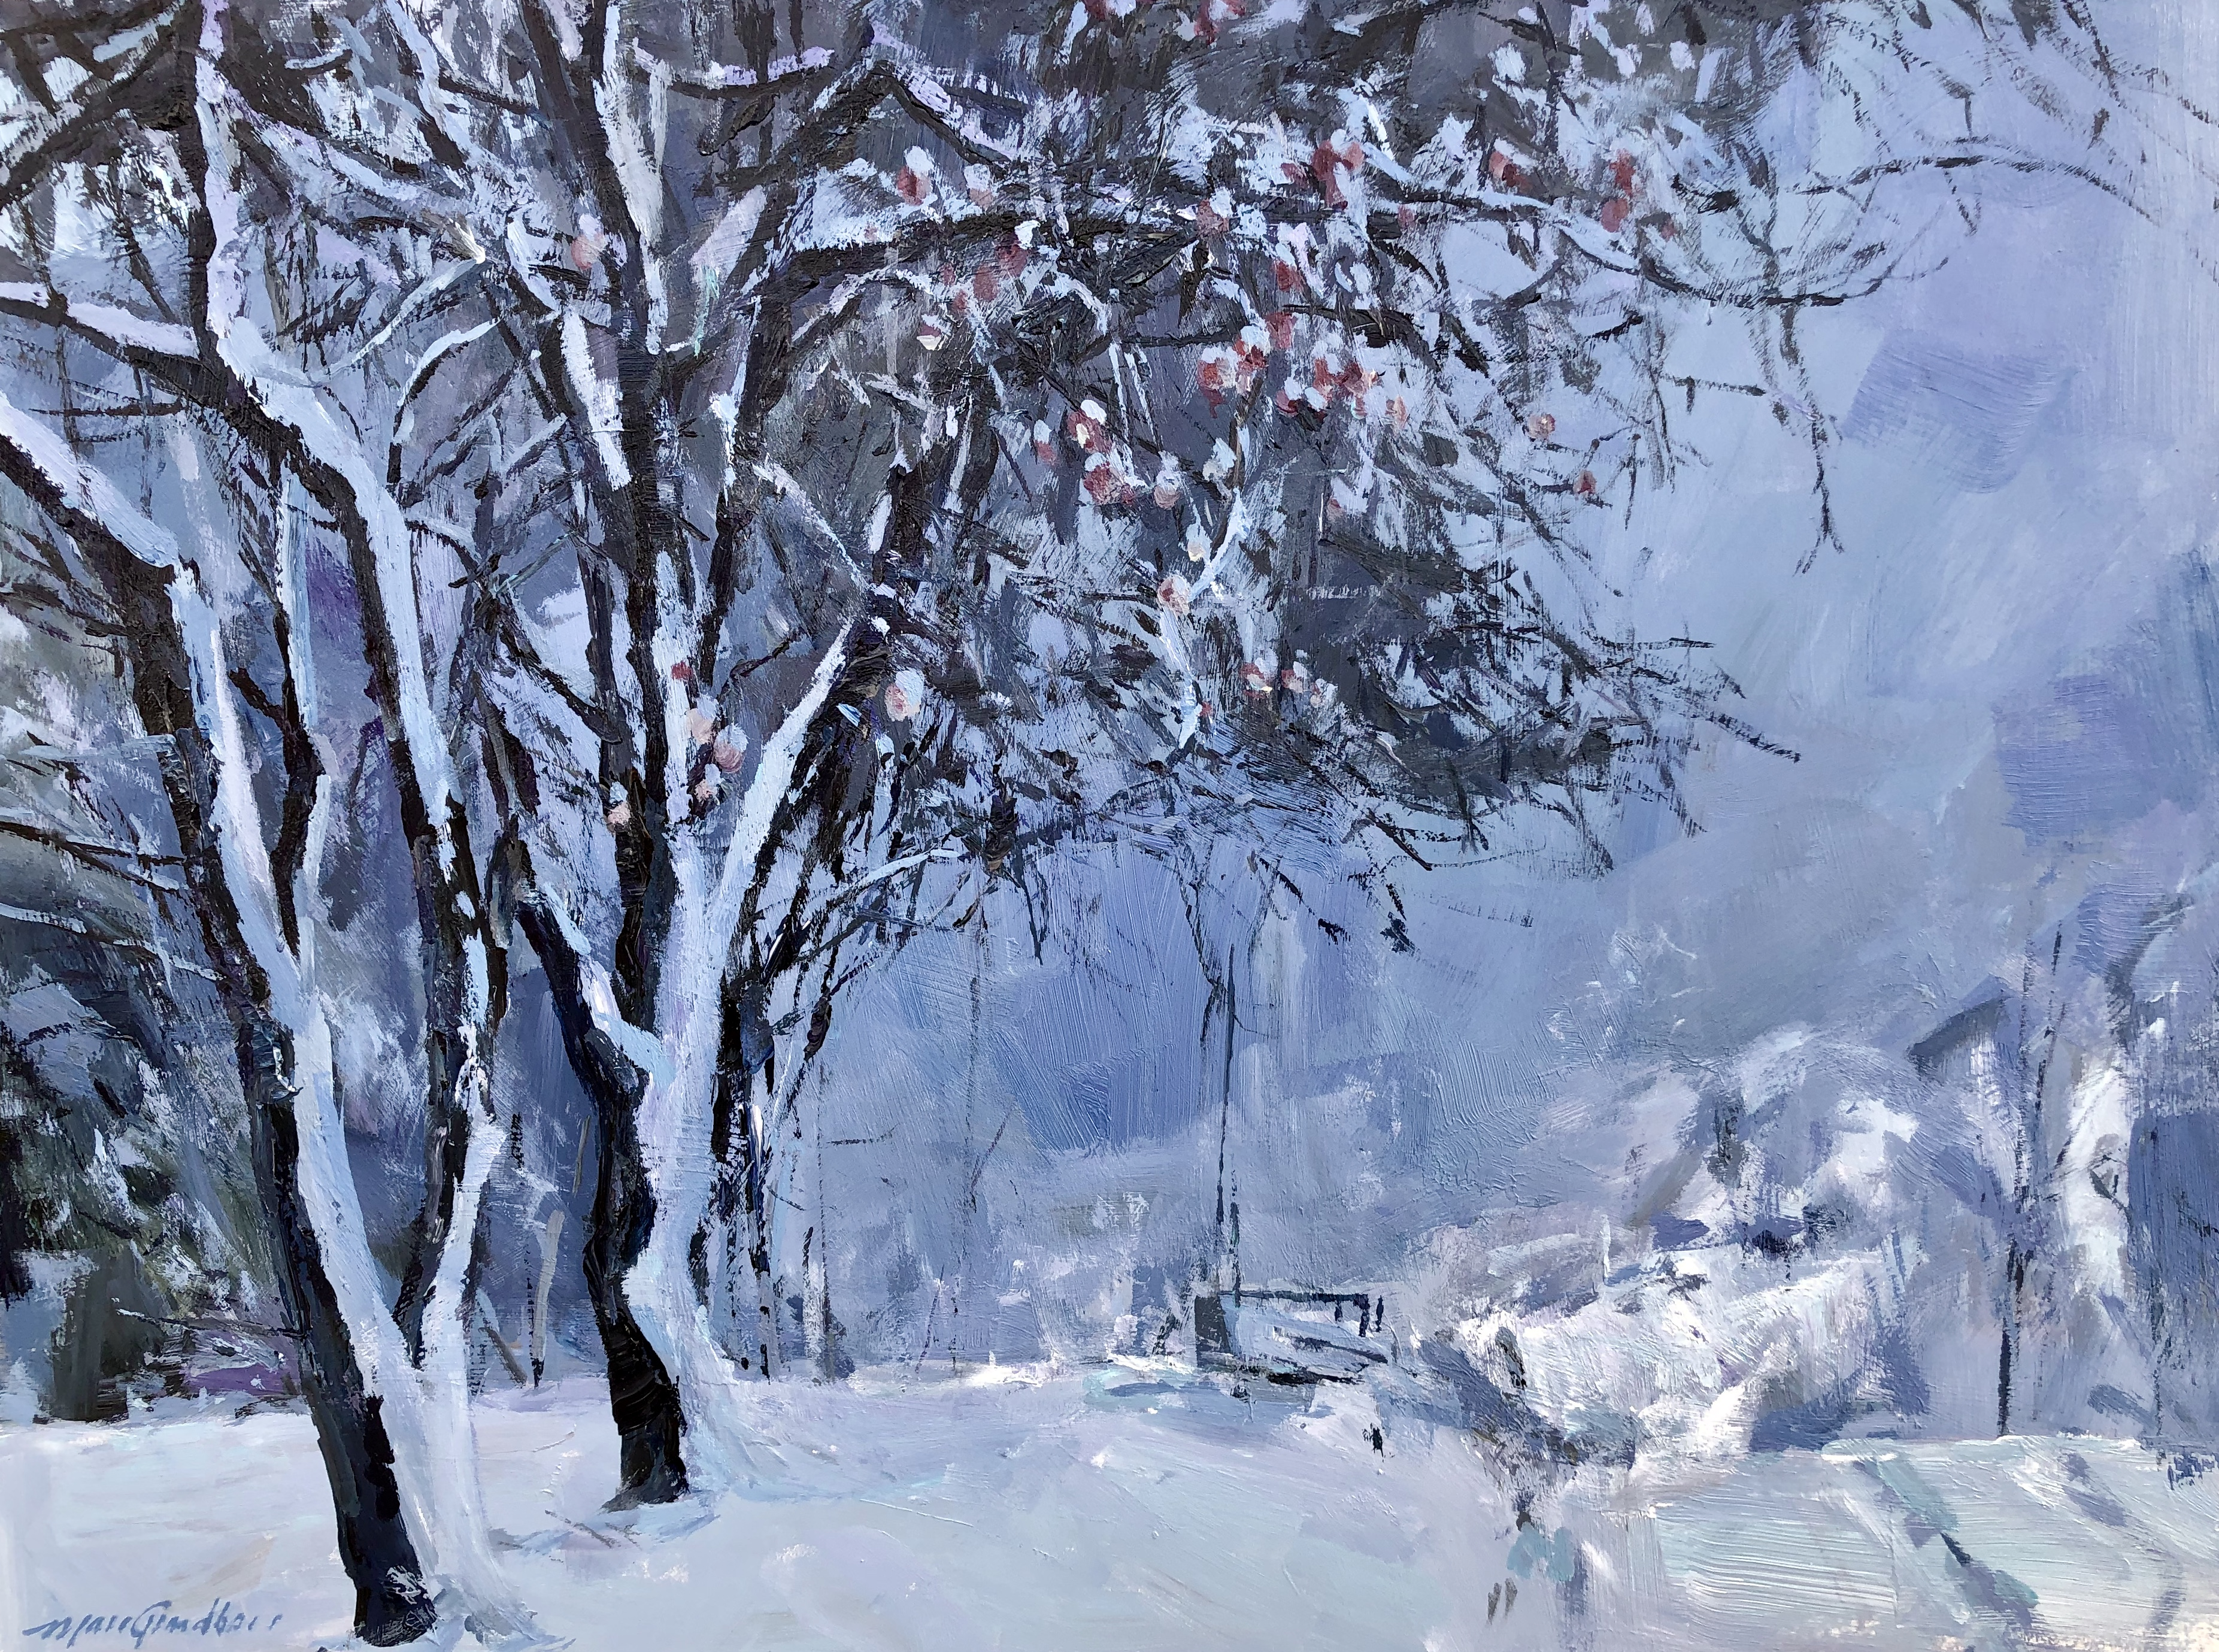 Pommiers sous la neige